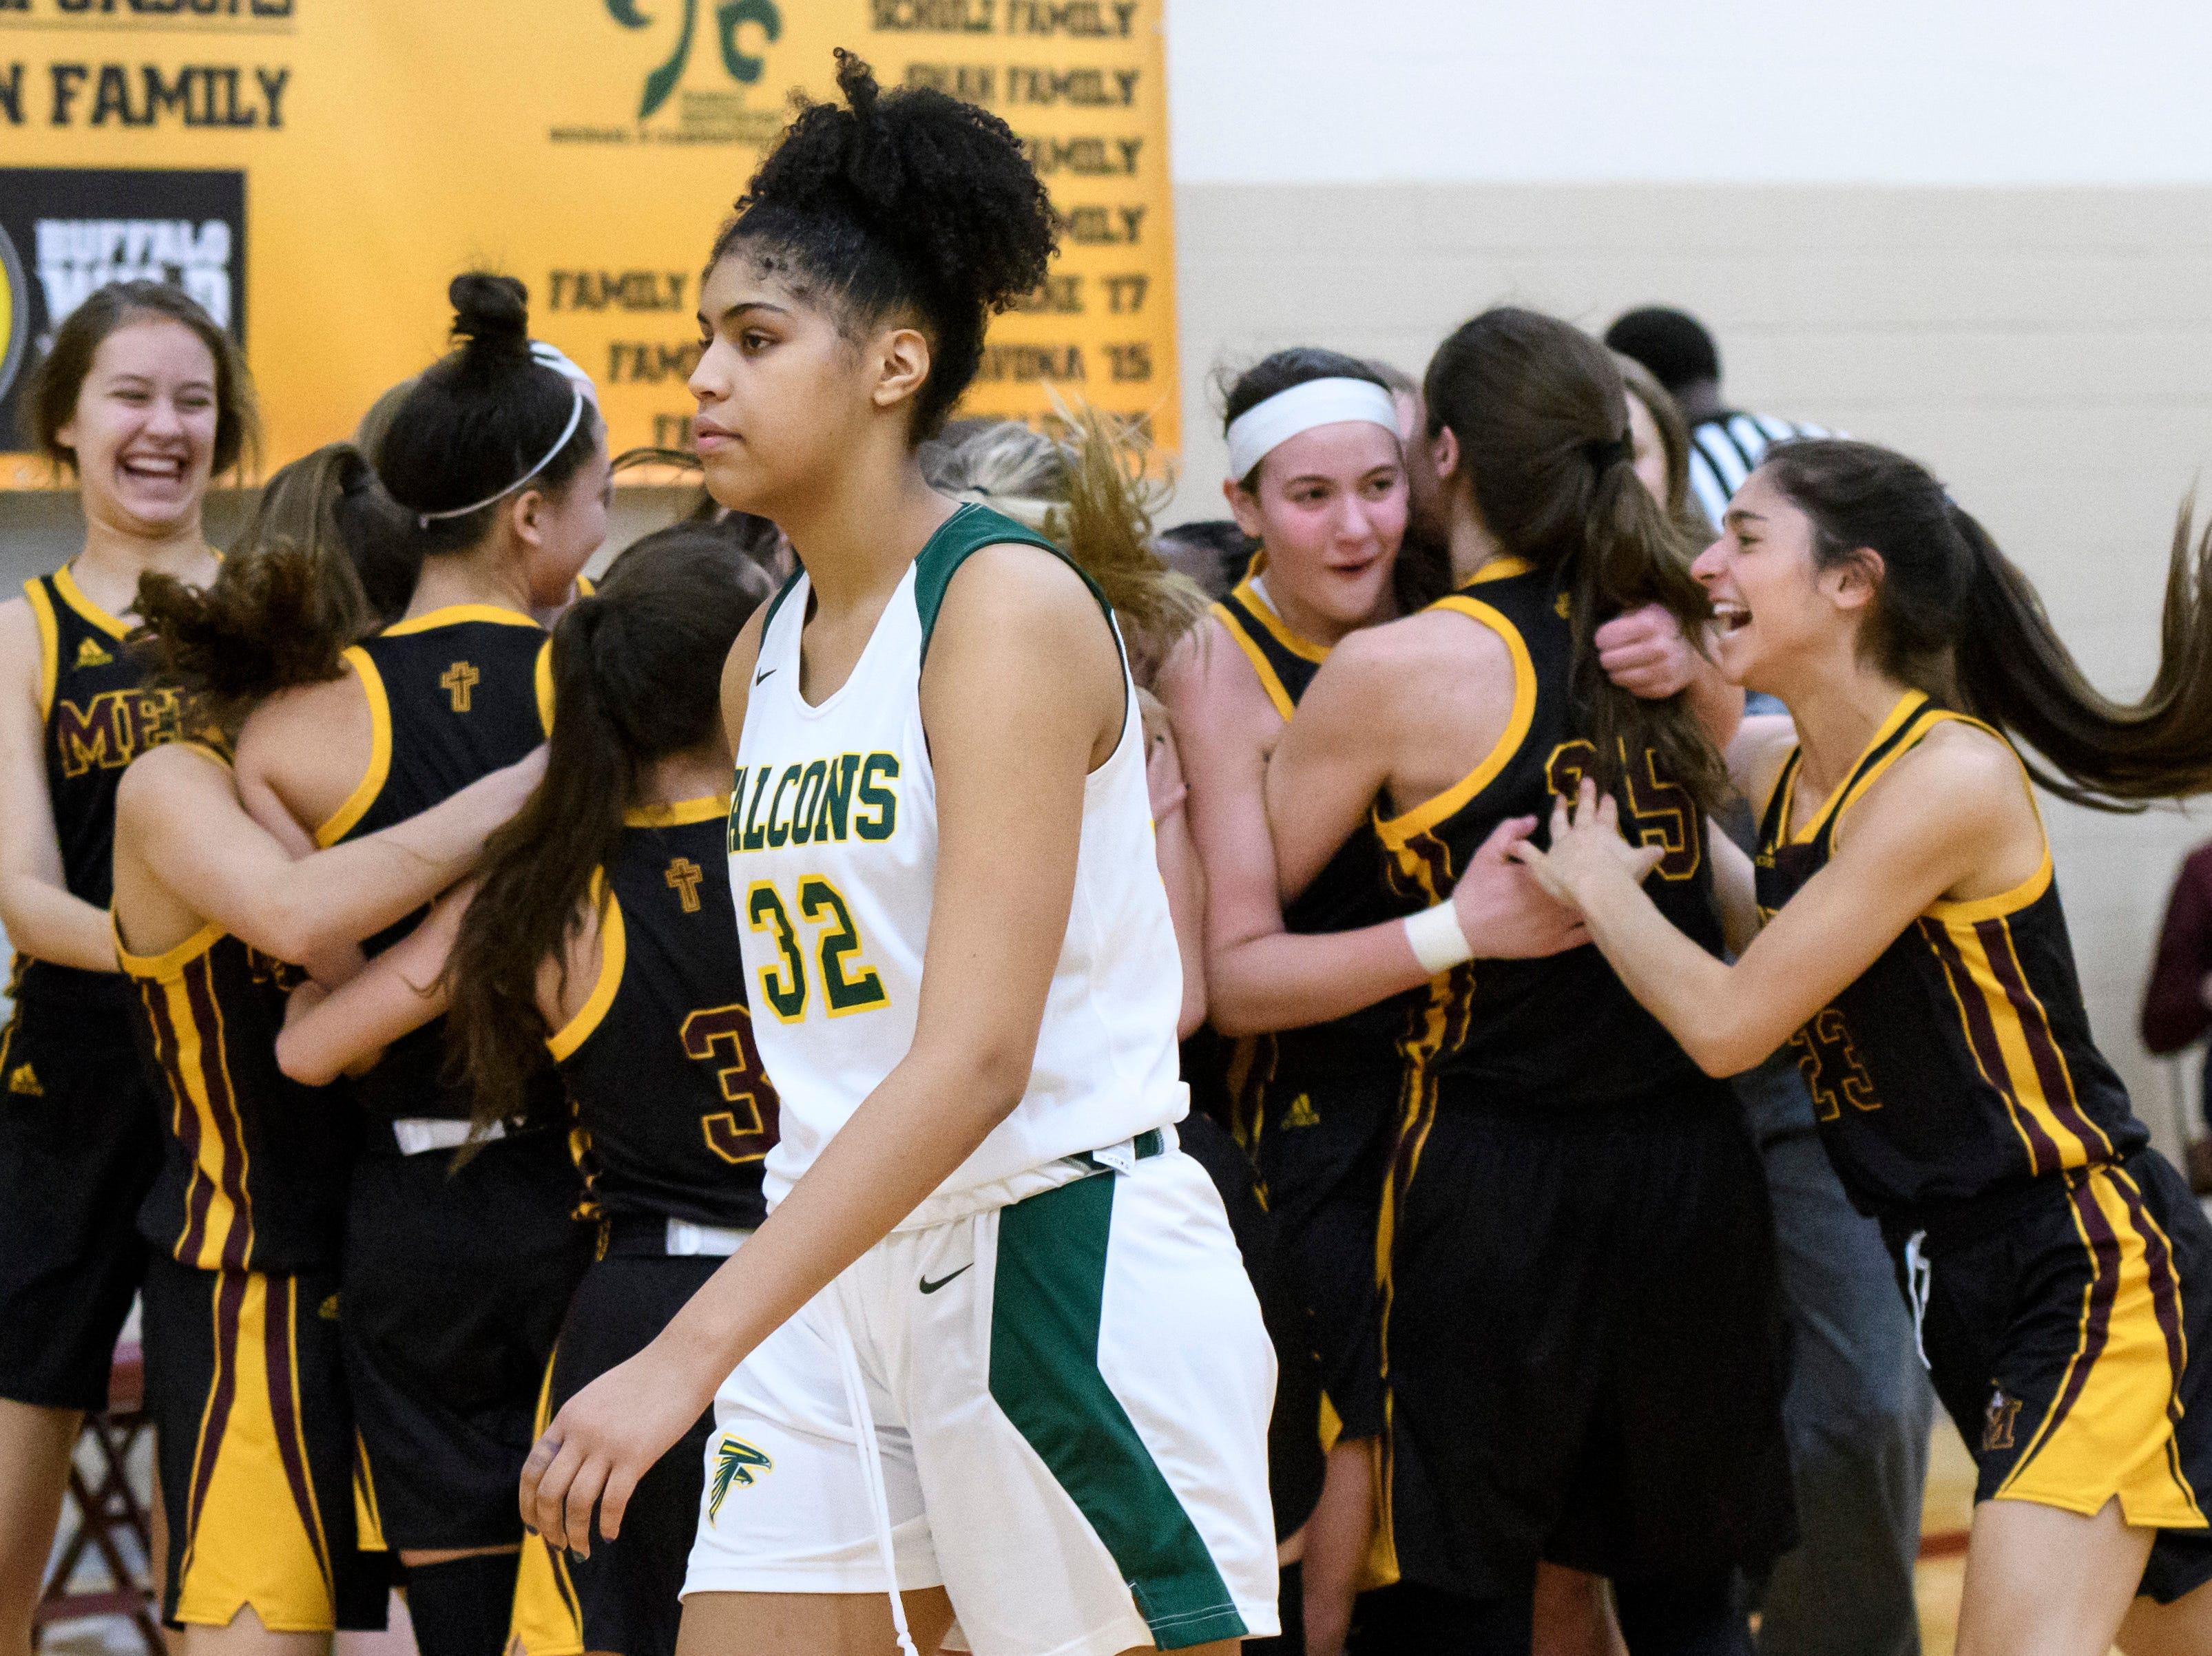 Birmingham Groves' Jasmine Worthy walks past the celebrating Farmington Mercy team after losing a big game at Farmington Mercy High School on February 26, 2018.